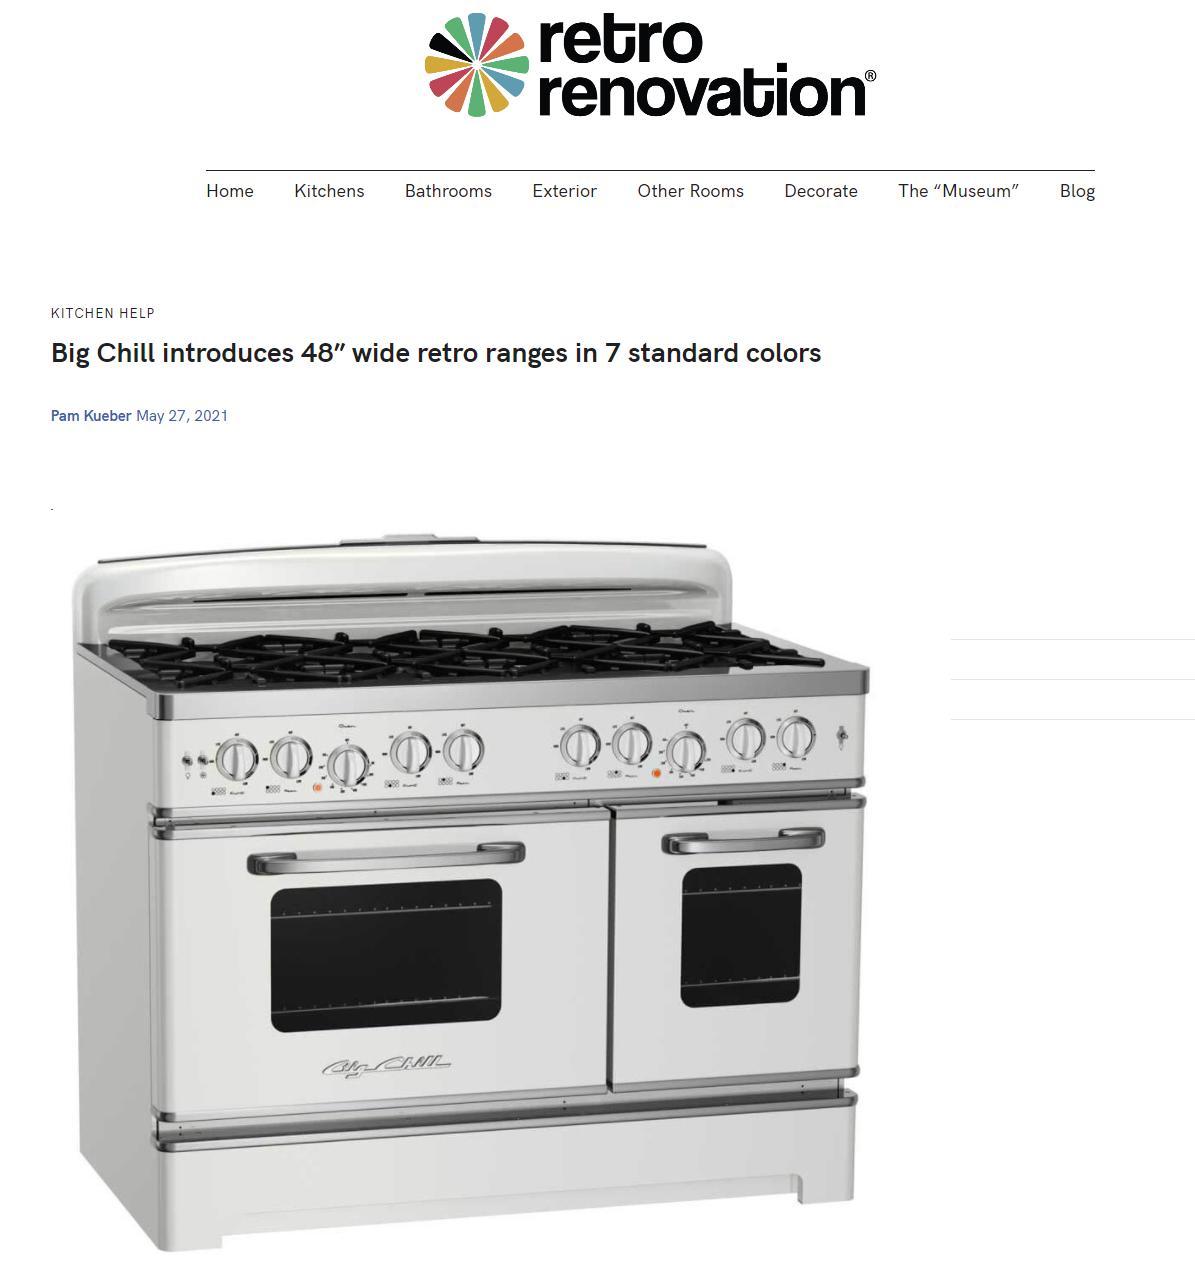 Retro Renovation Online - May 27, 2021